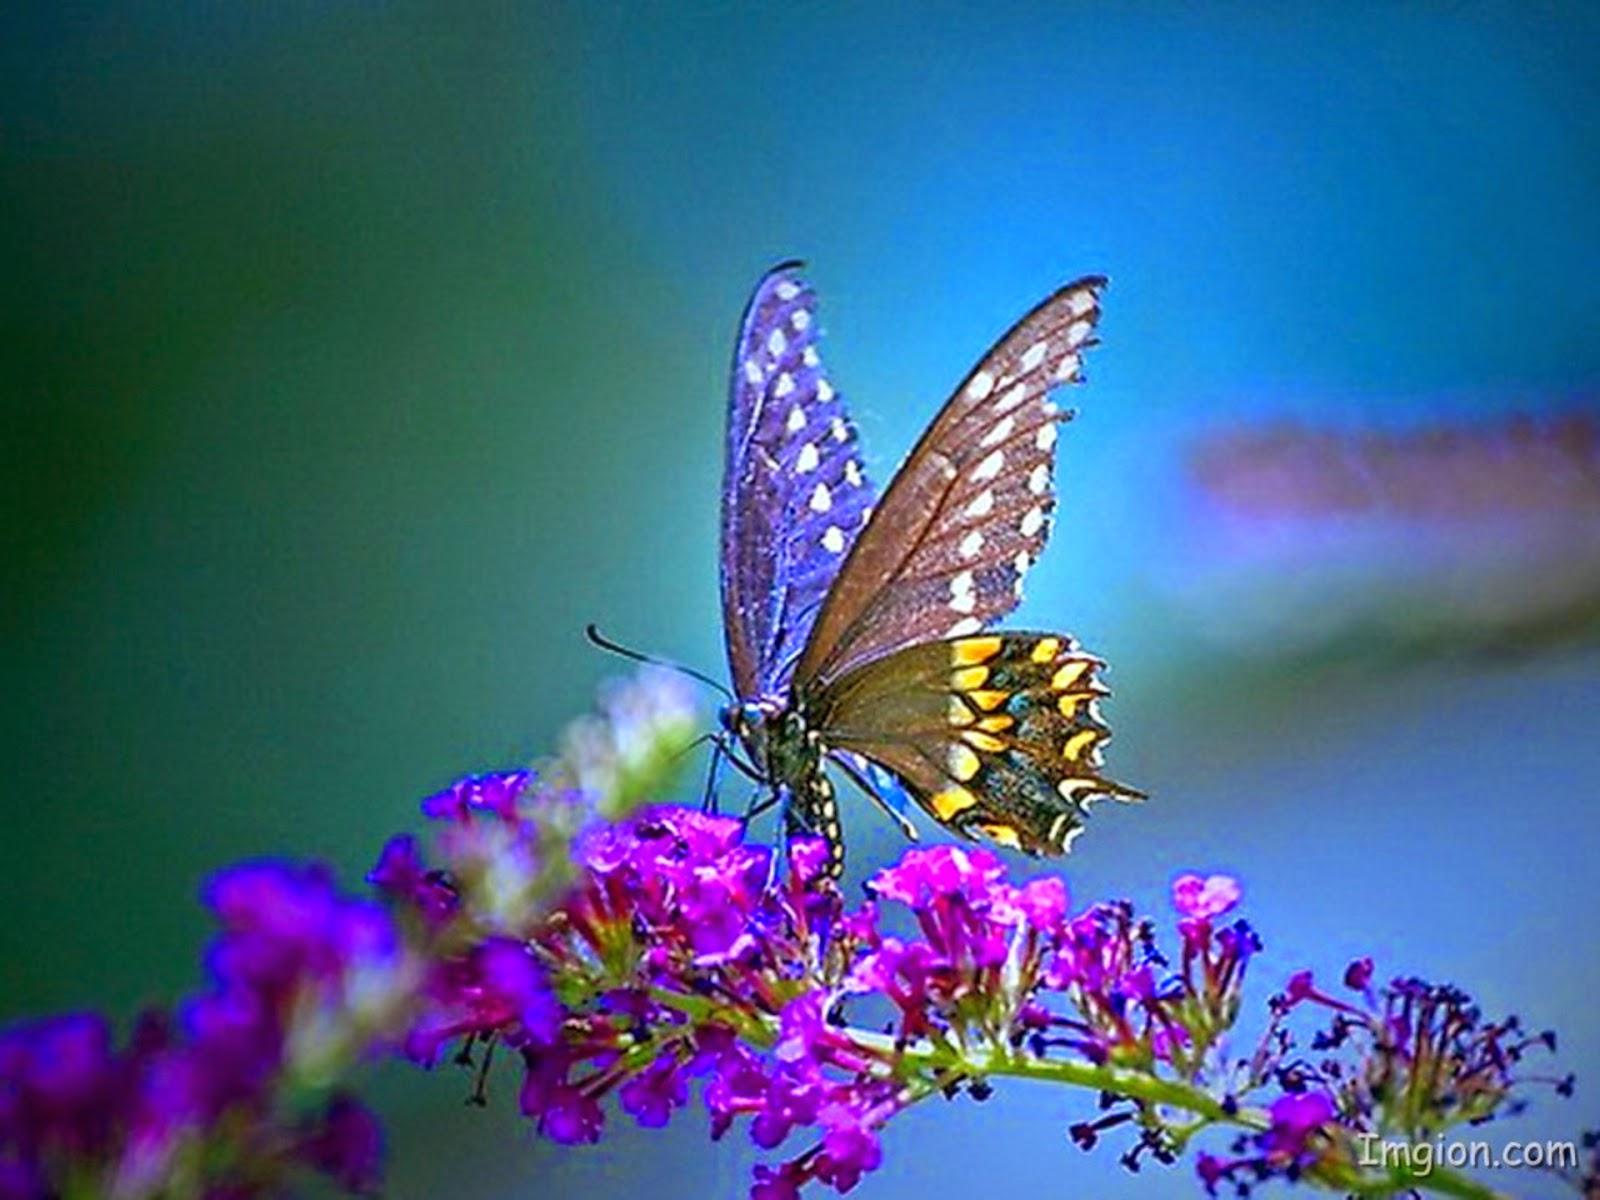 Best wallpaper beautiful butterfly wallpapers free download for Butterfly wallpaper